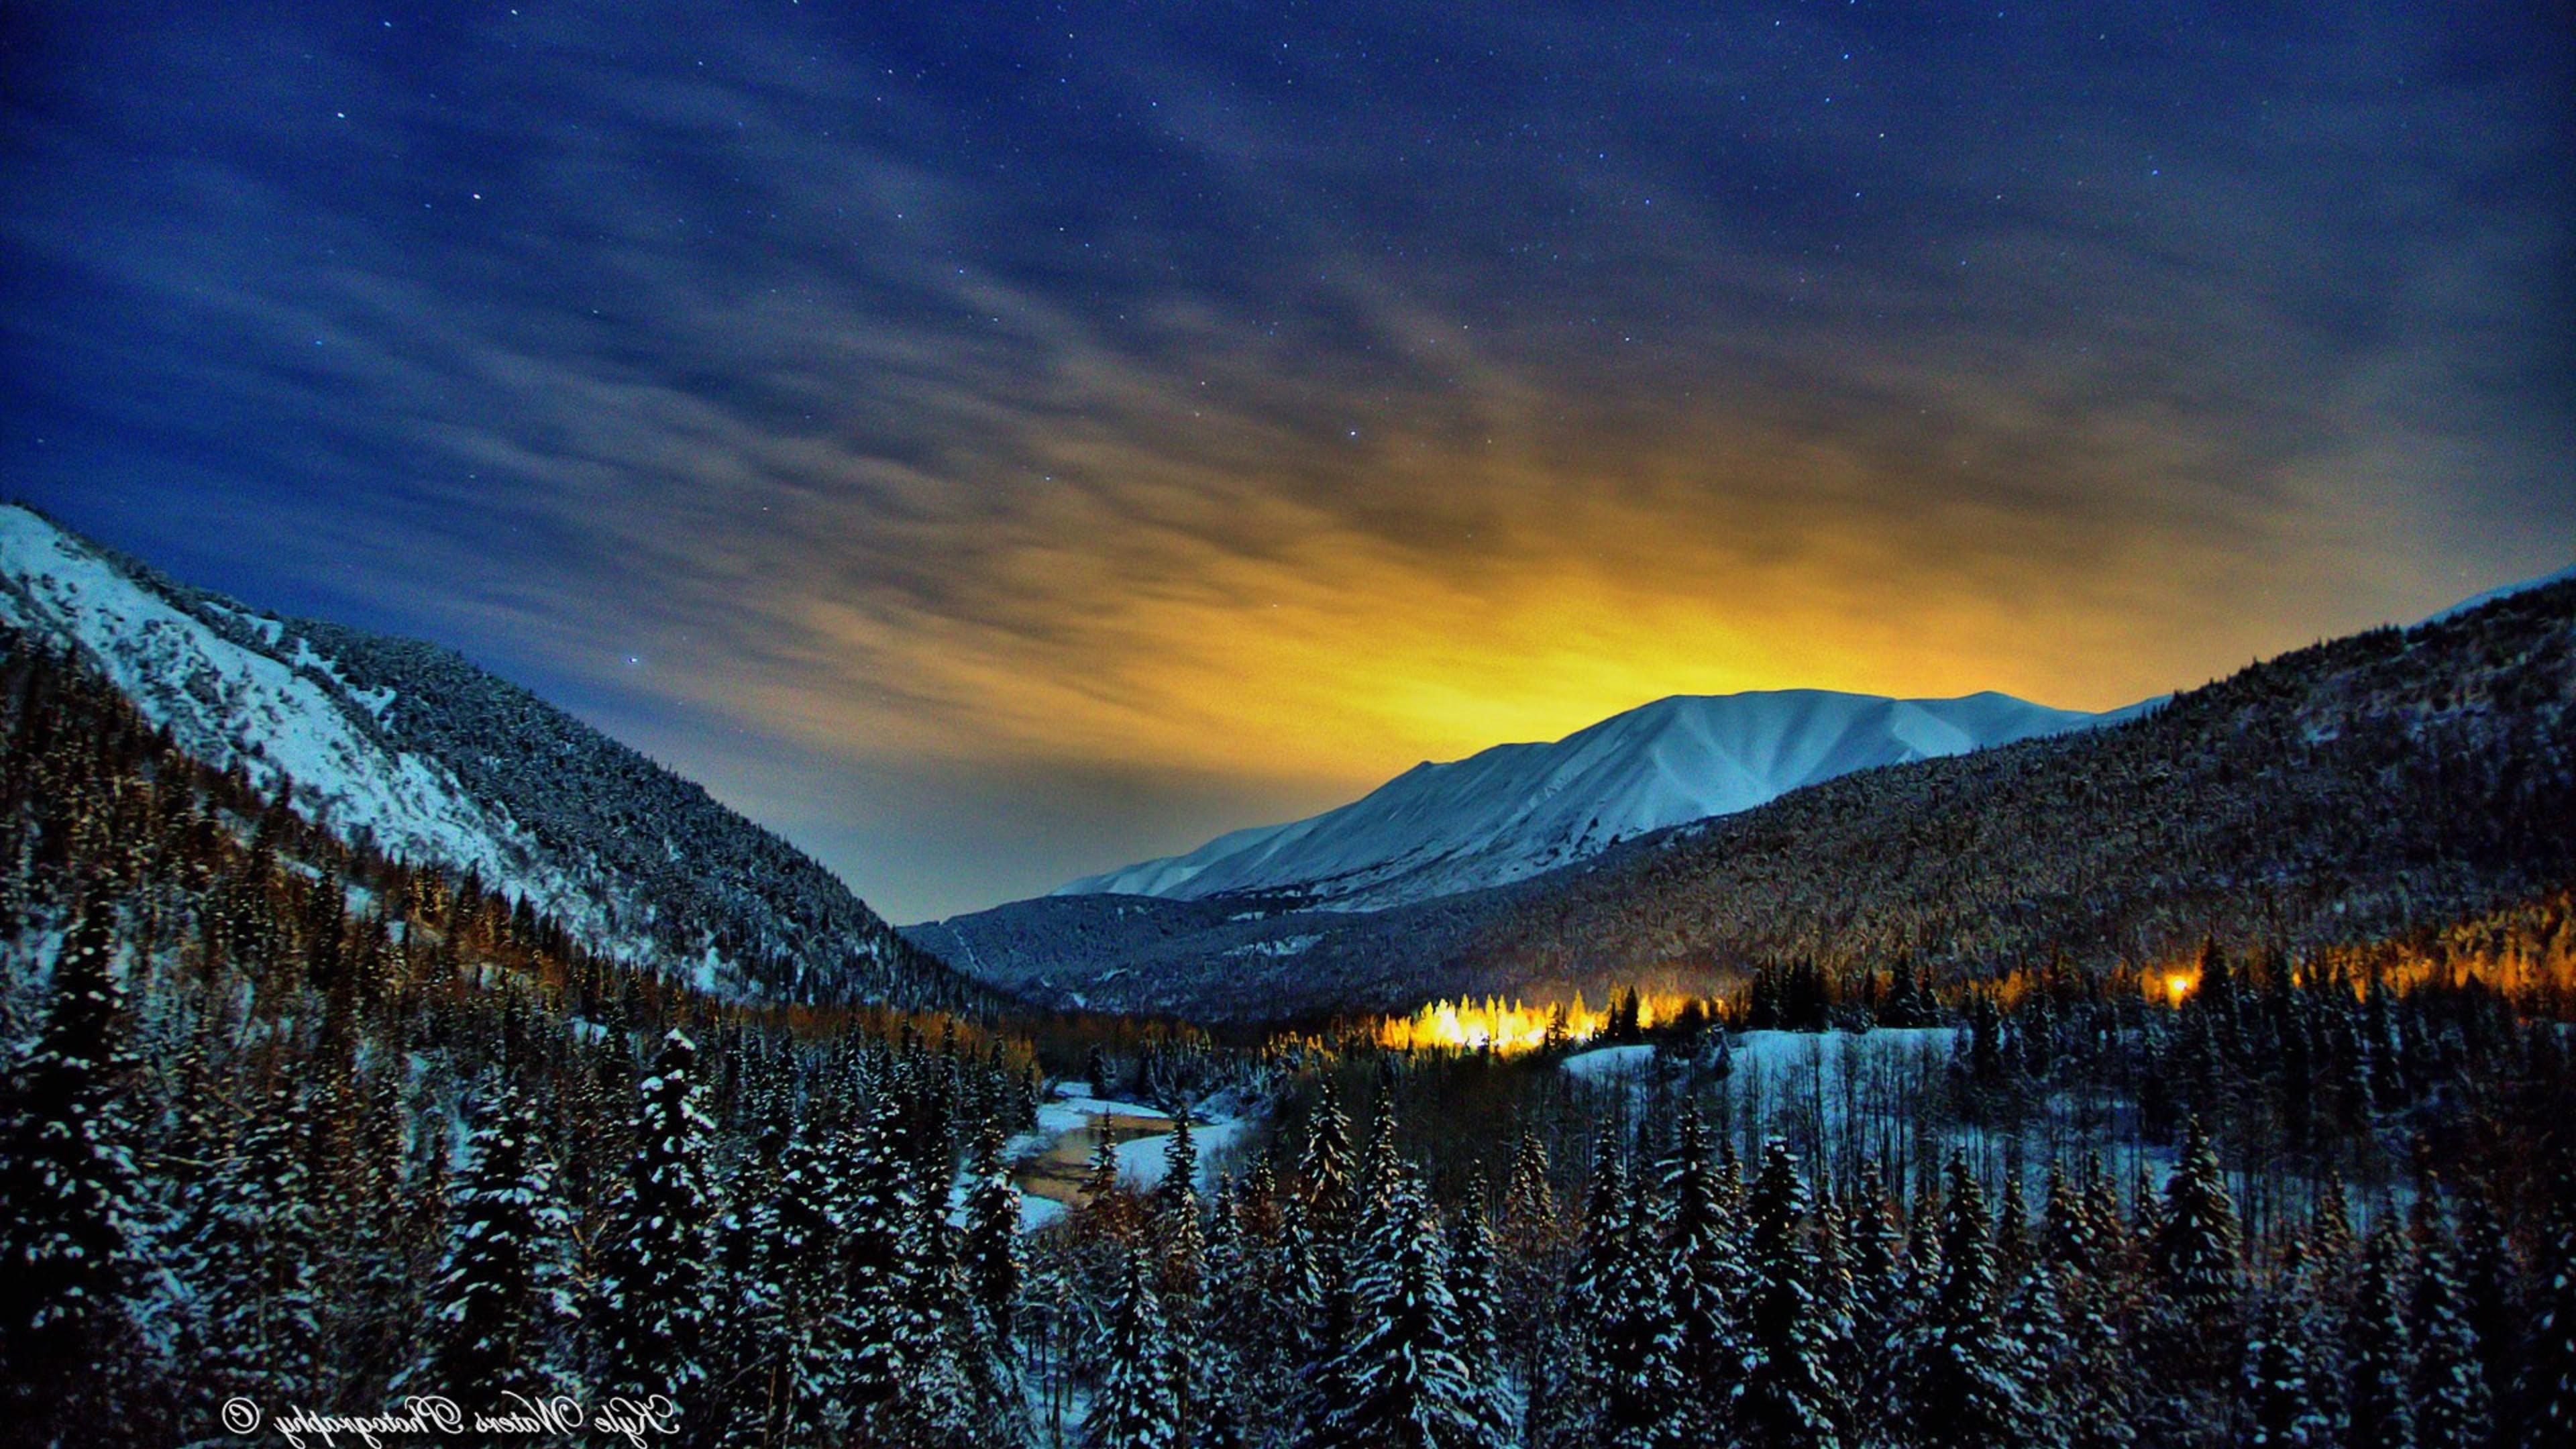 4k Laptop Wallpaper Fall Forest Alaska Winter Nights Hd Nature 4k Wallpapers Images